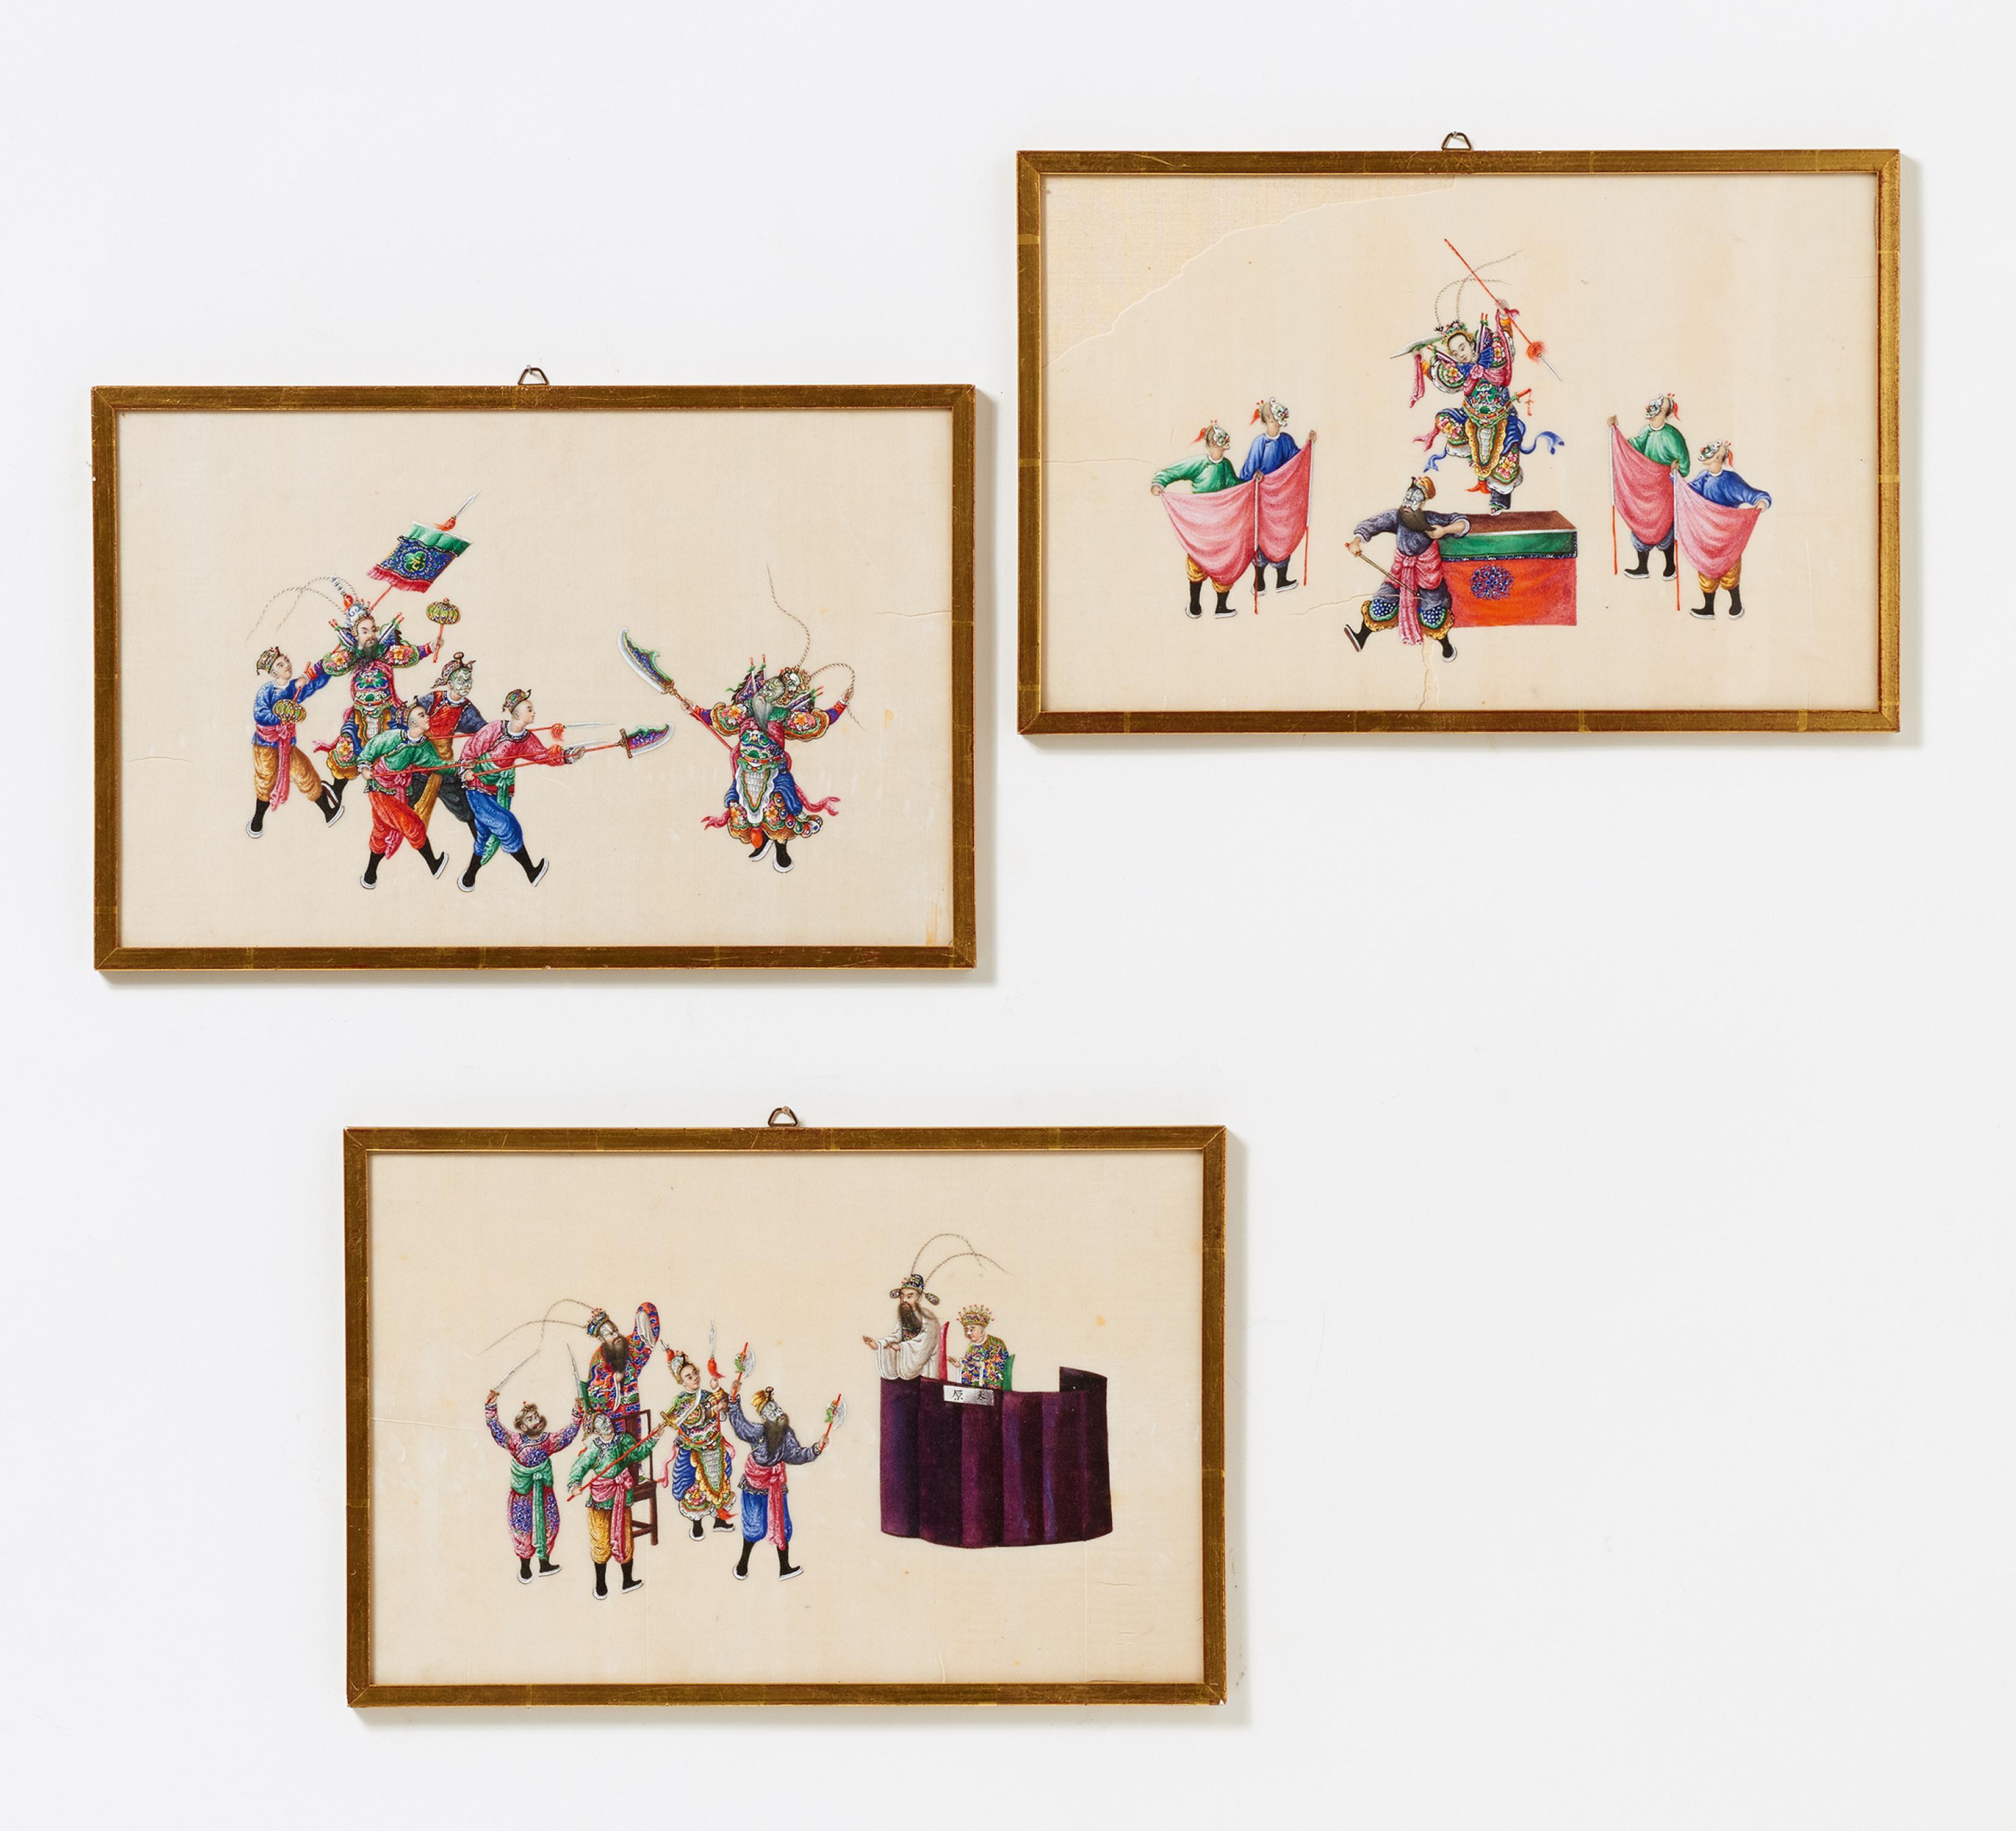 Lot 31 - THREE OPERA SCENES. Origin: China. Canton. Dynasty: Qing dynasty (1644-1911). Maker/Designer: In the